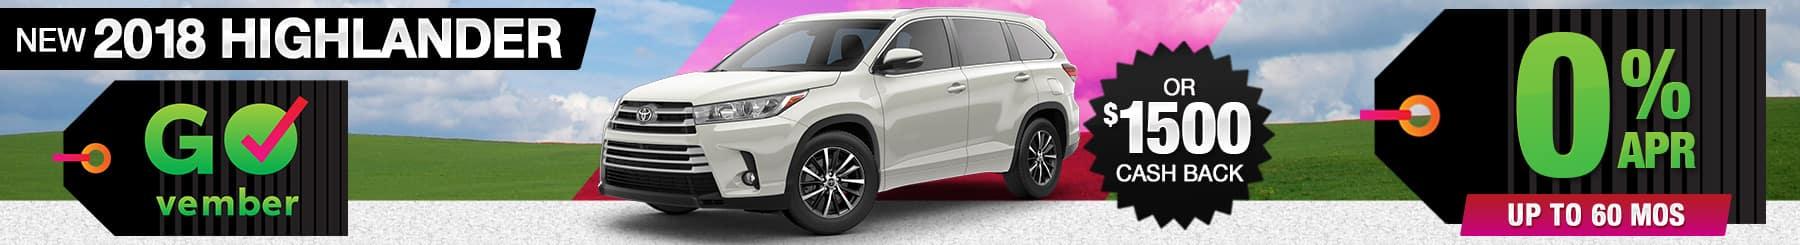 Toyota-Highlander-Finance-Special